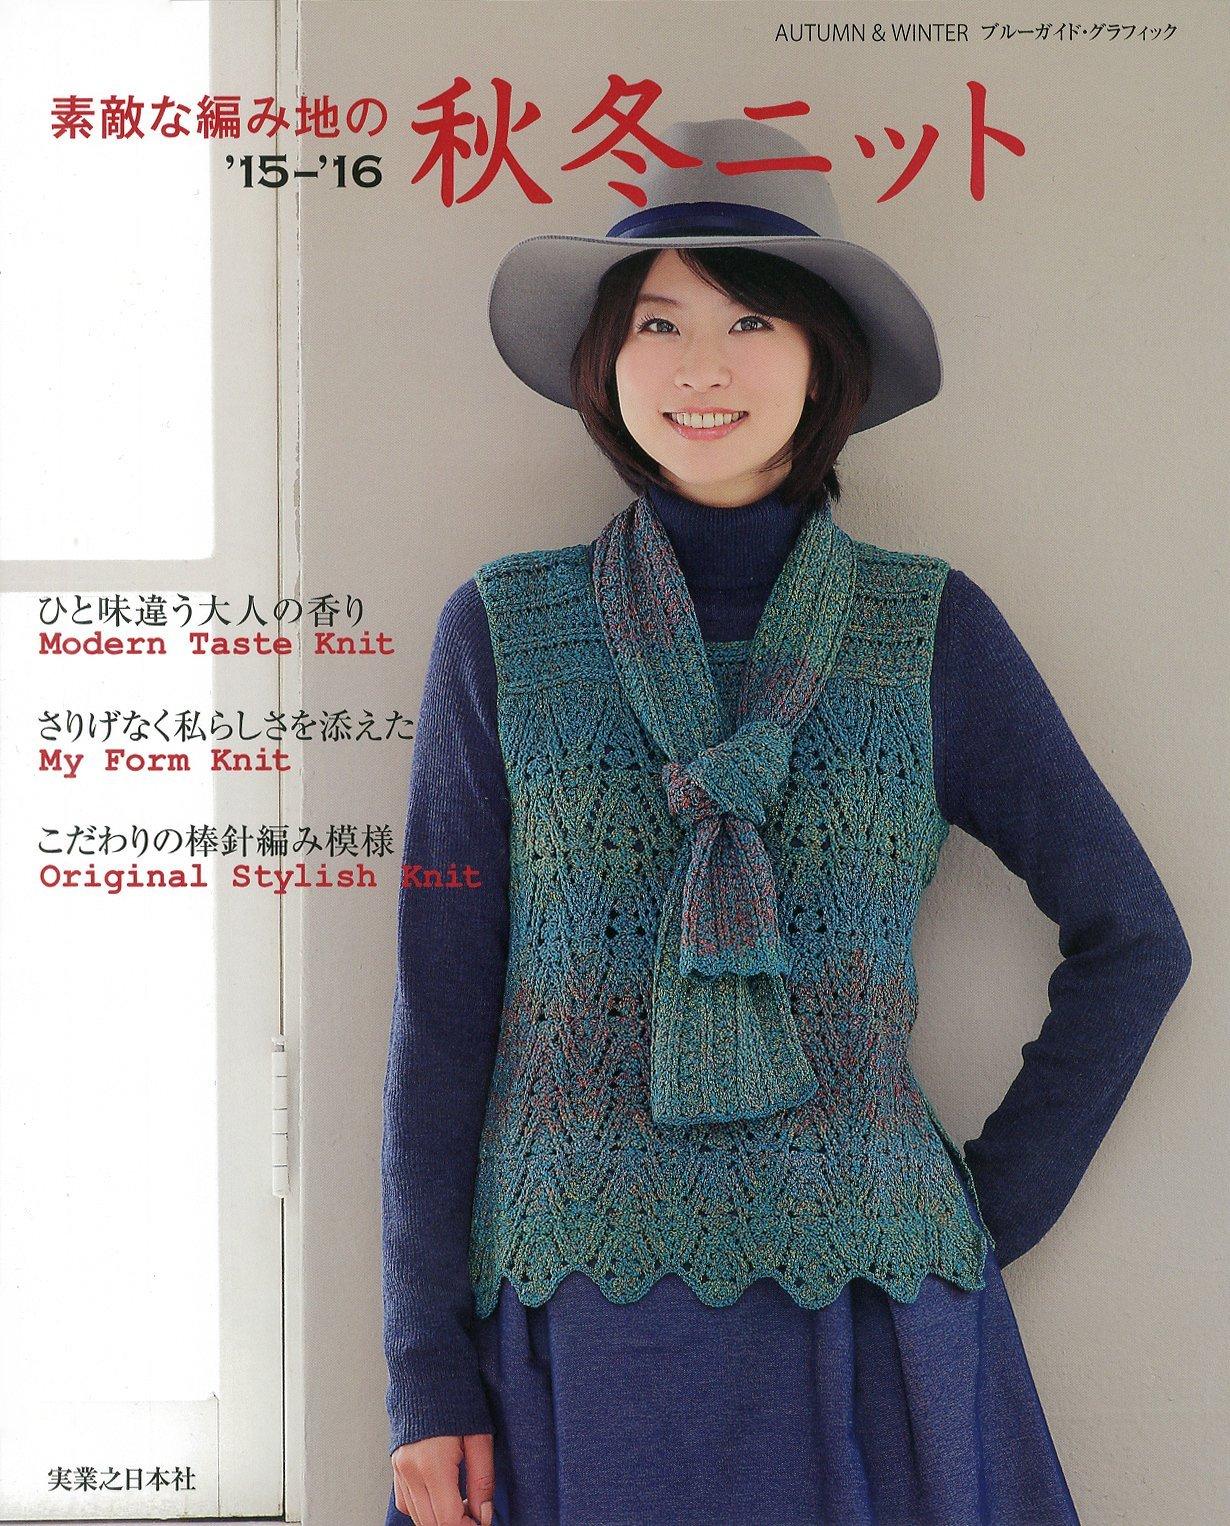 Wonderful knit 2015 -2016